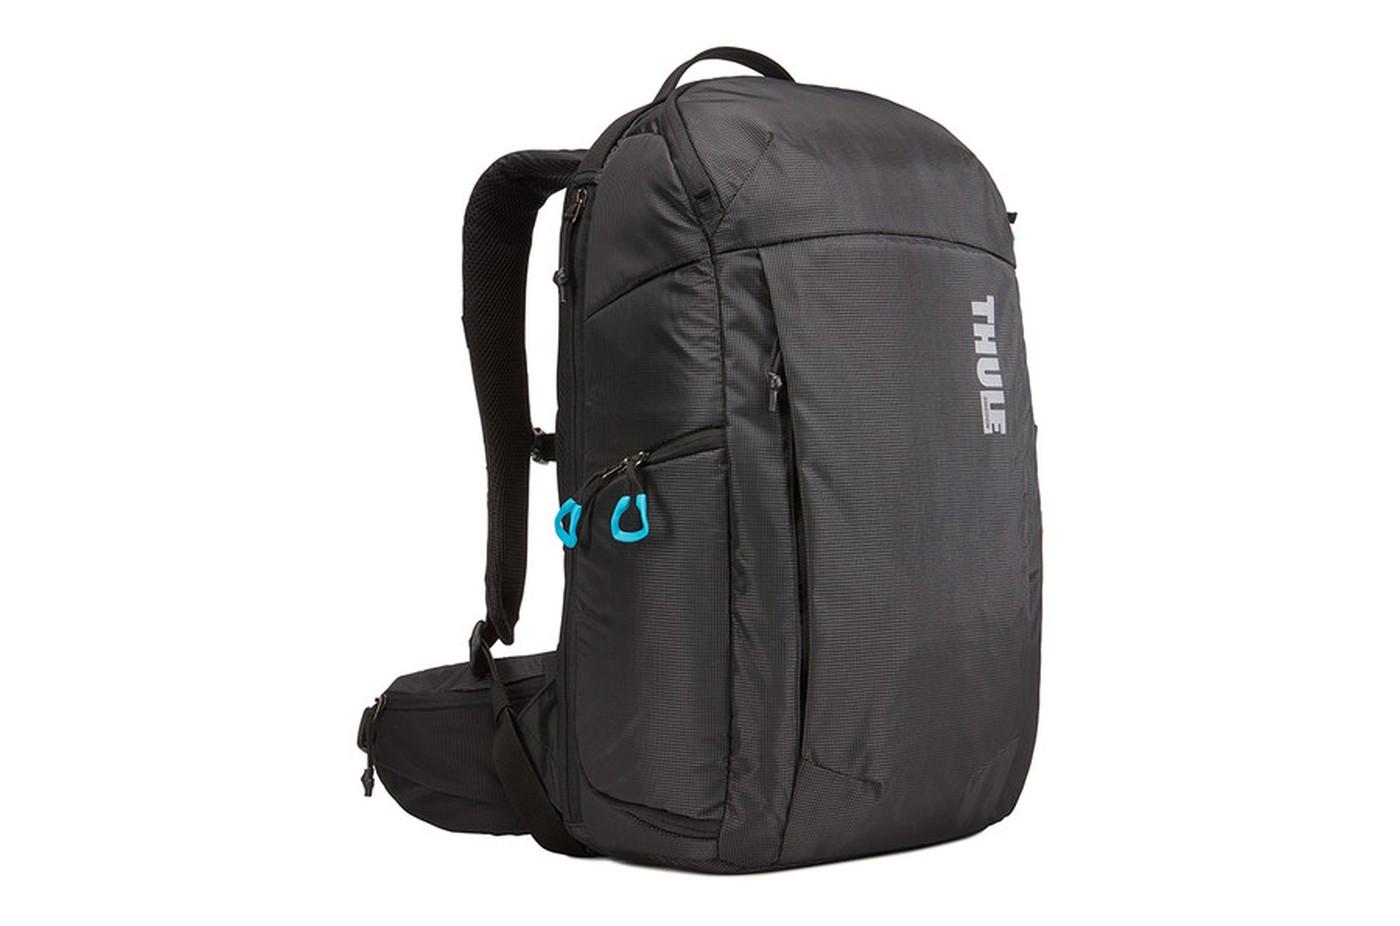 THULE Aspect DSLR Backpack -  - Kamerataschen